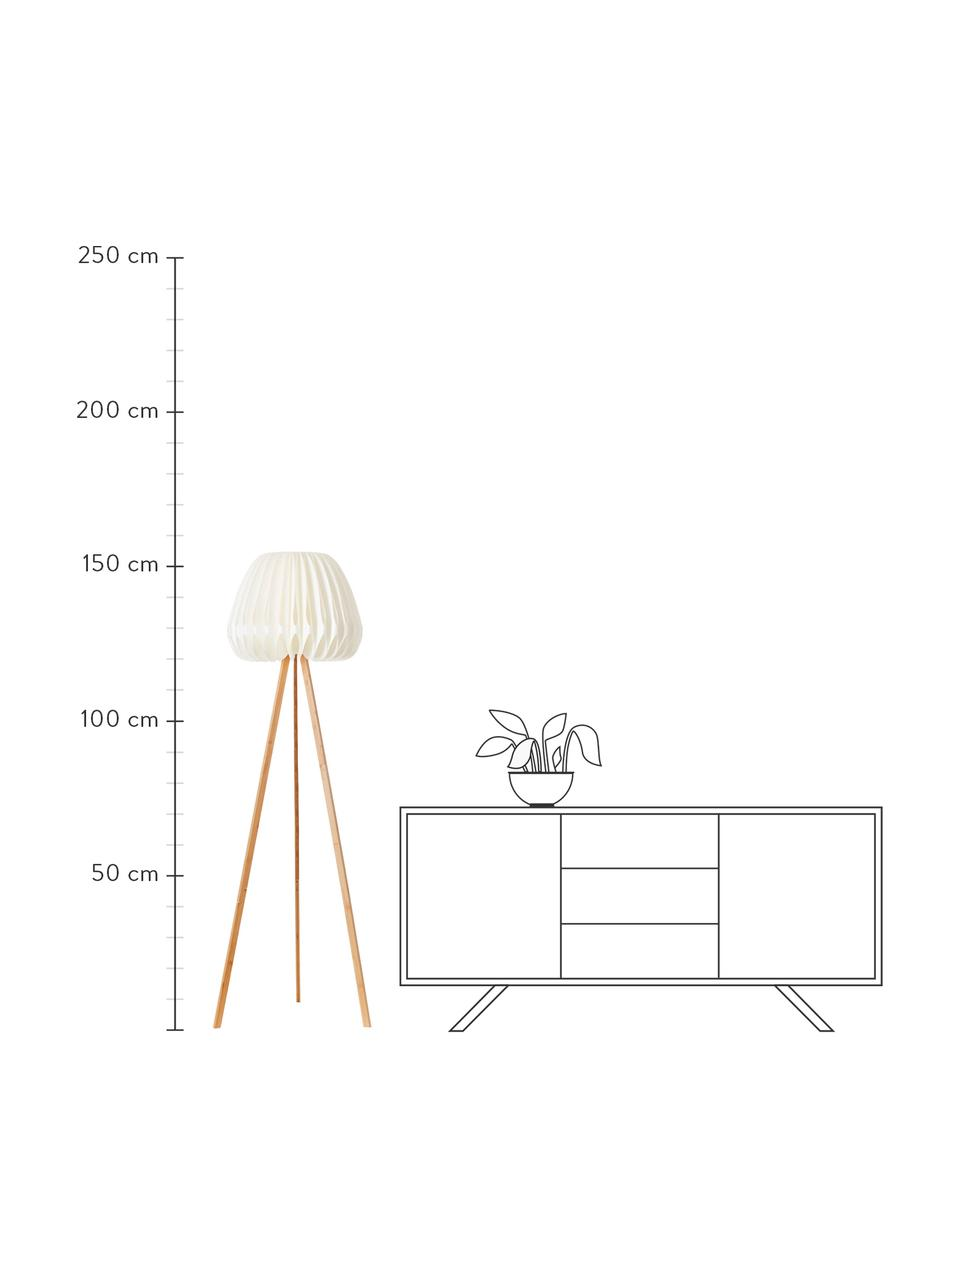 Design tripod vloerlamp Inna van bamboehout, Lampenkap: kunststof, Lampvoet: bamboe, Wit, bamboekleurig, Ø 62 x H 155 cm